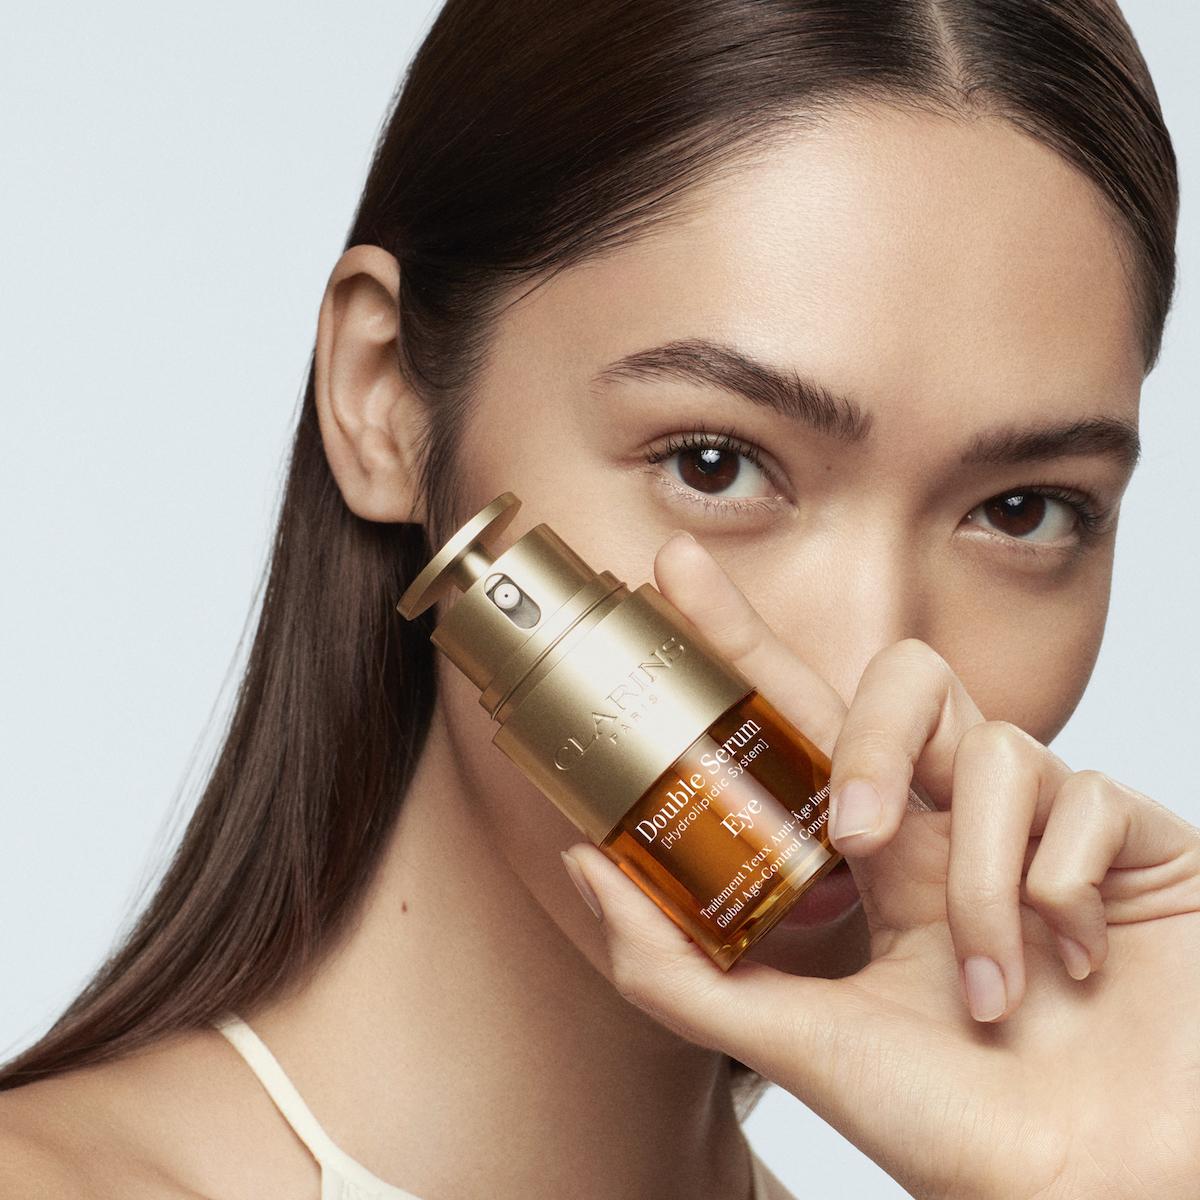 Anti-ageing Skincare: Clarins